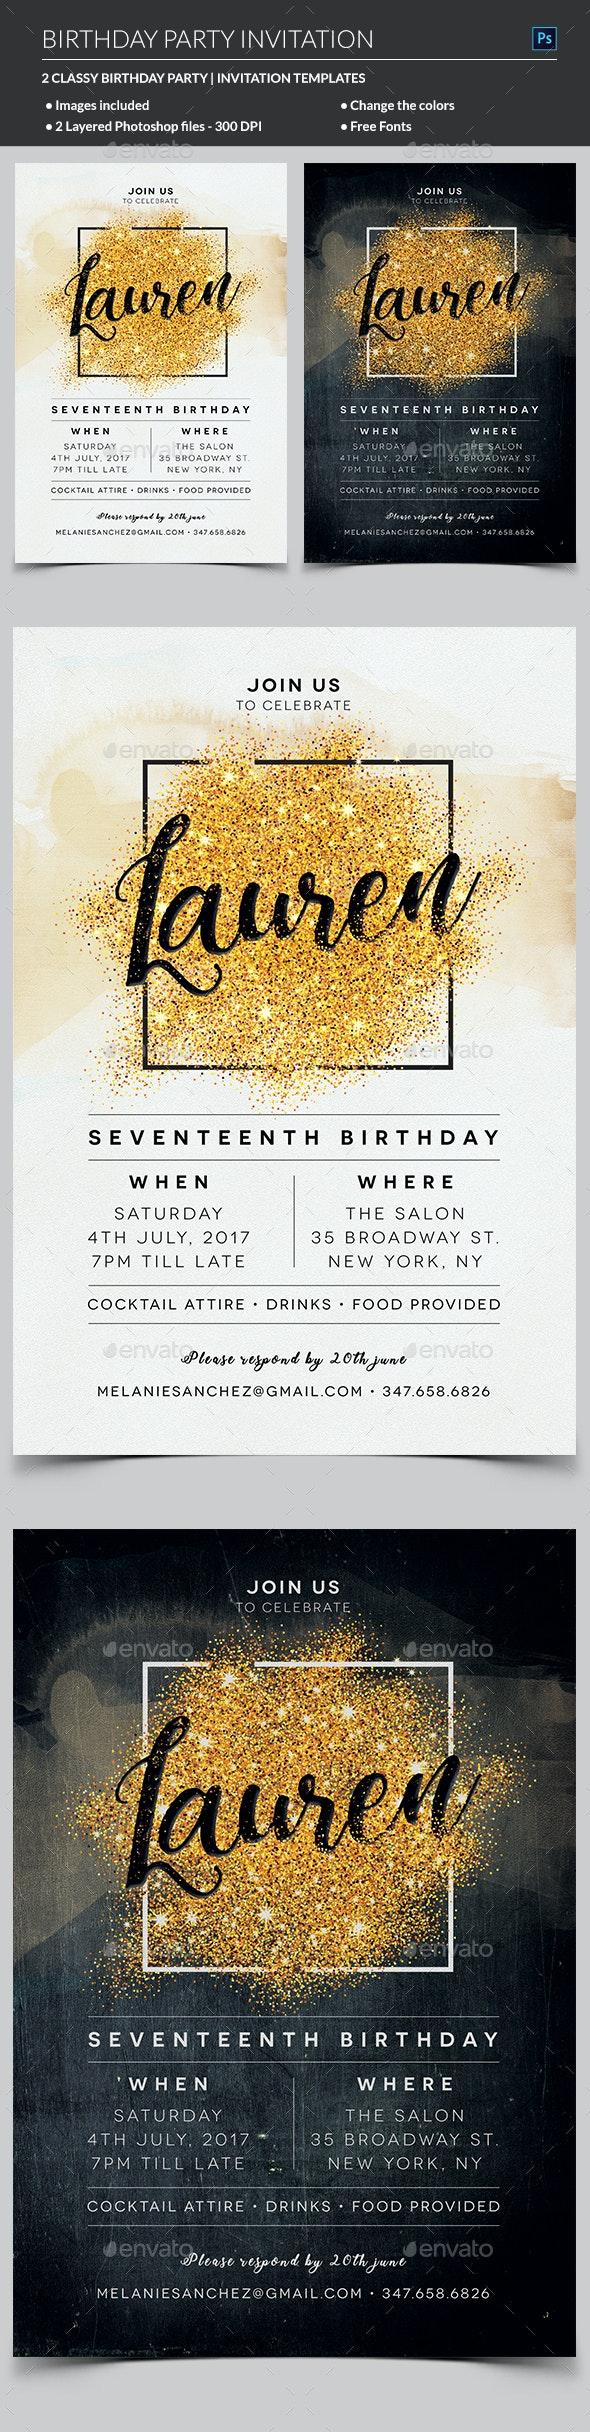 Elegant Birthday Invitation - Invitations Cards & Invites